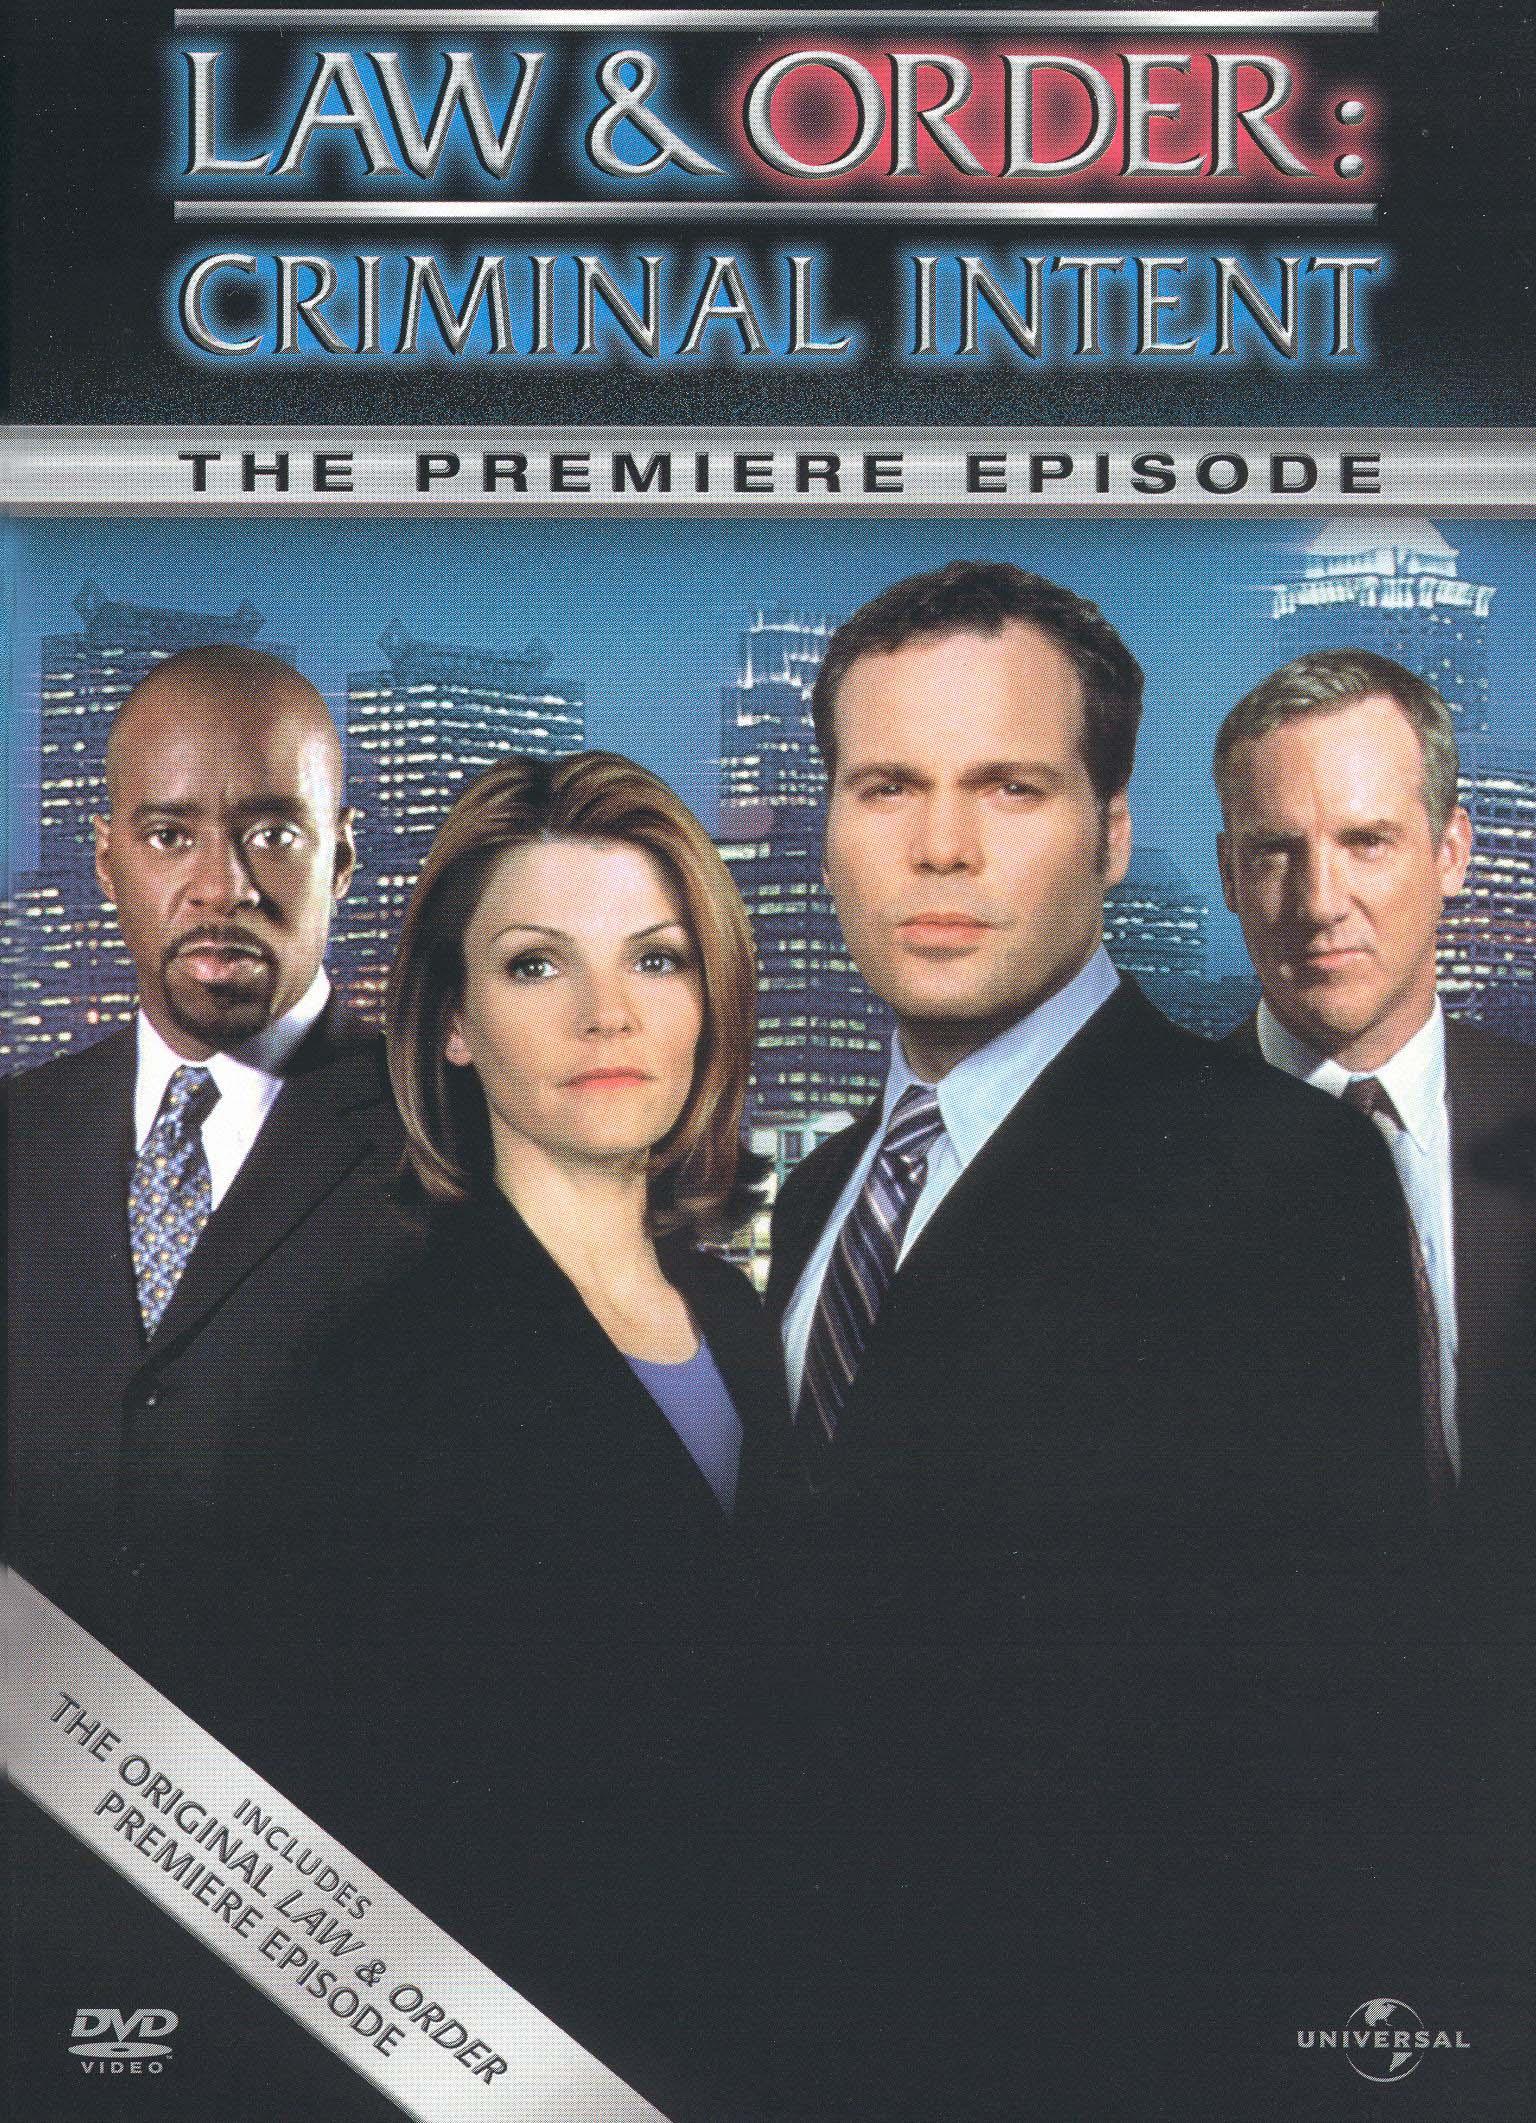 Law & Order: Criminal Intent: One